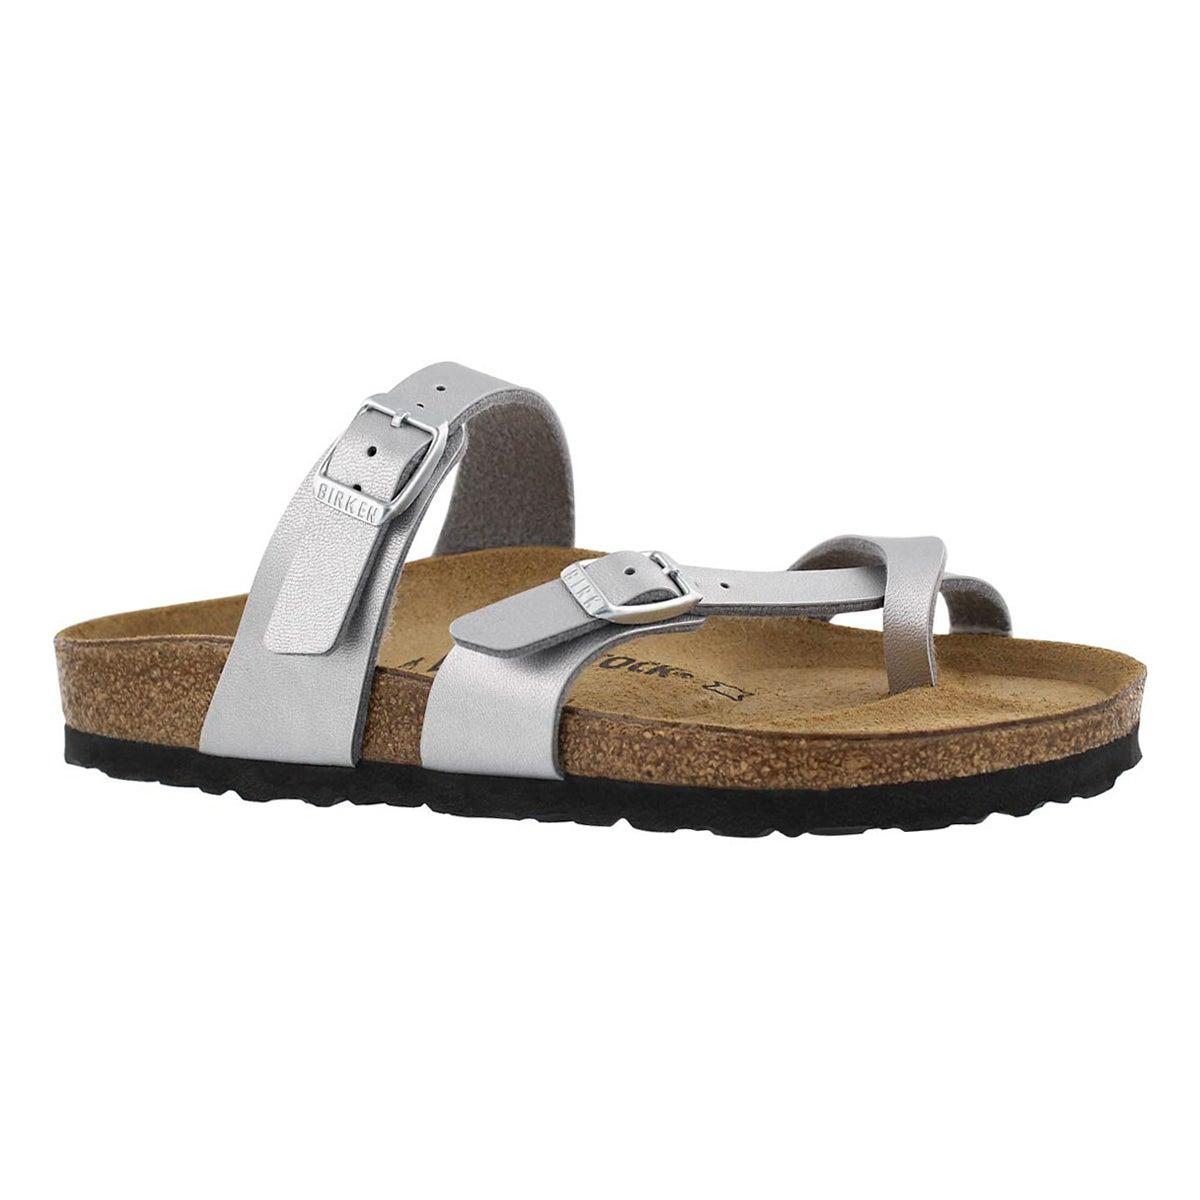 Women's MAYARI BF silver toe sleeve thong sandals